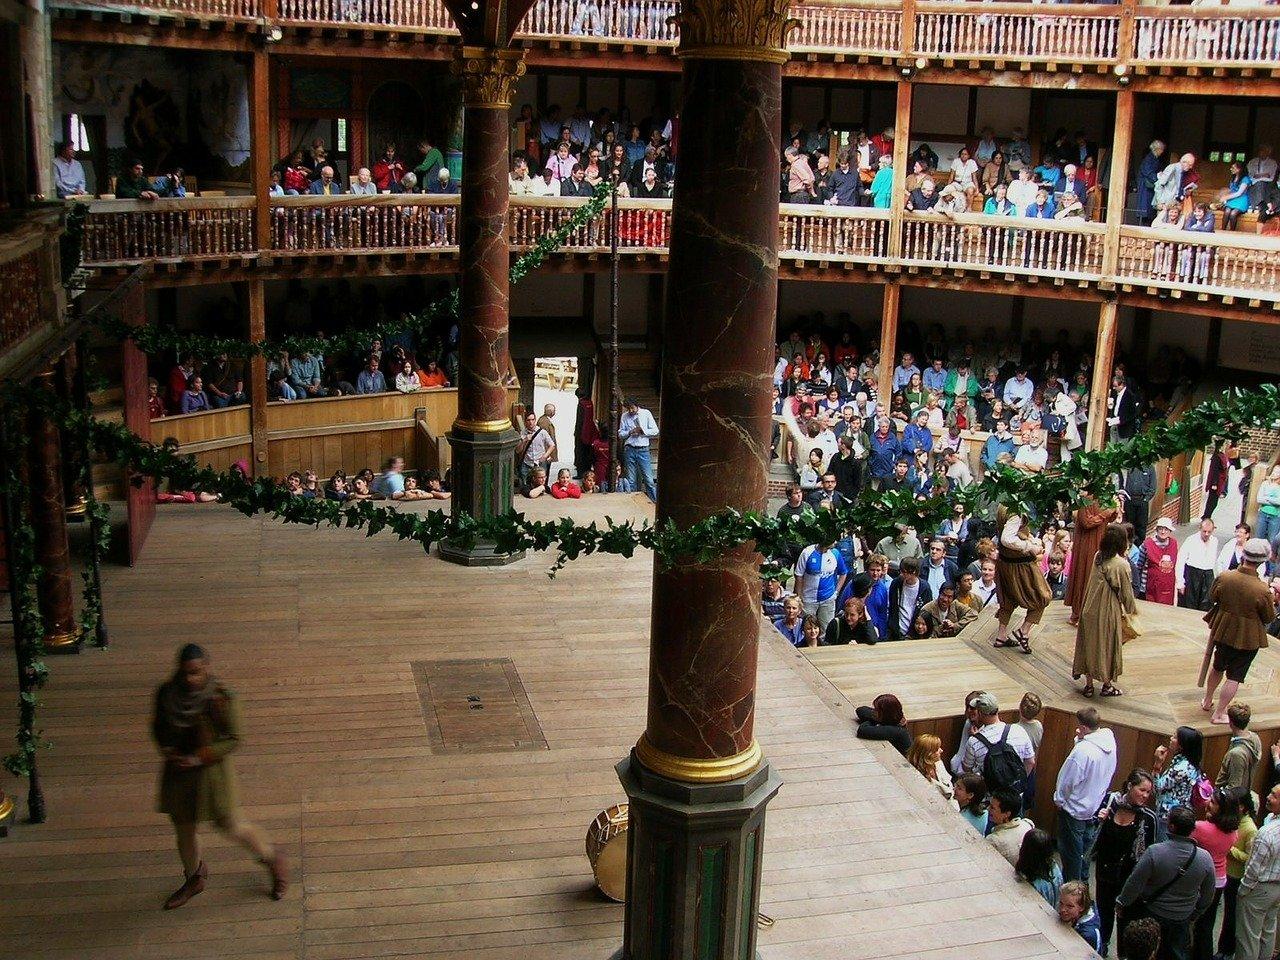 shakespear's-globe-theatre